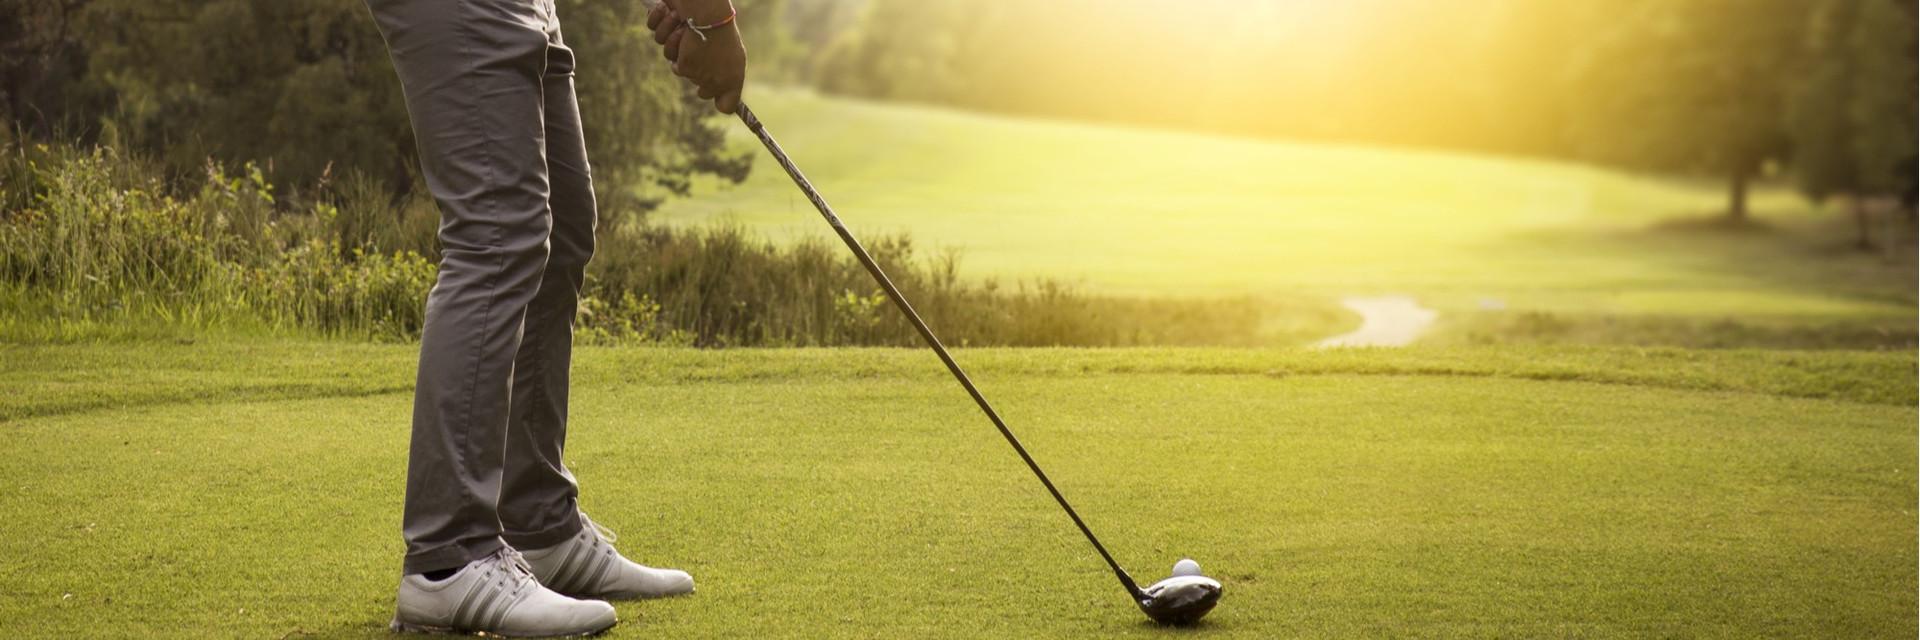 Feel Well, Play Well: Amazing Golf through Whole Health